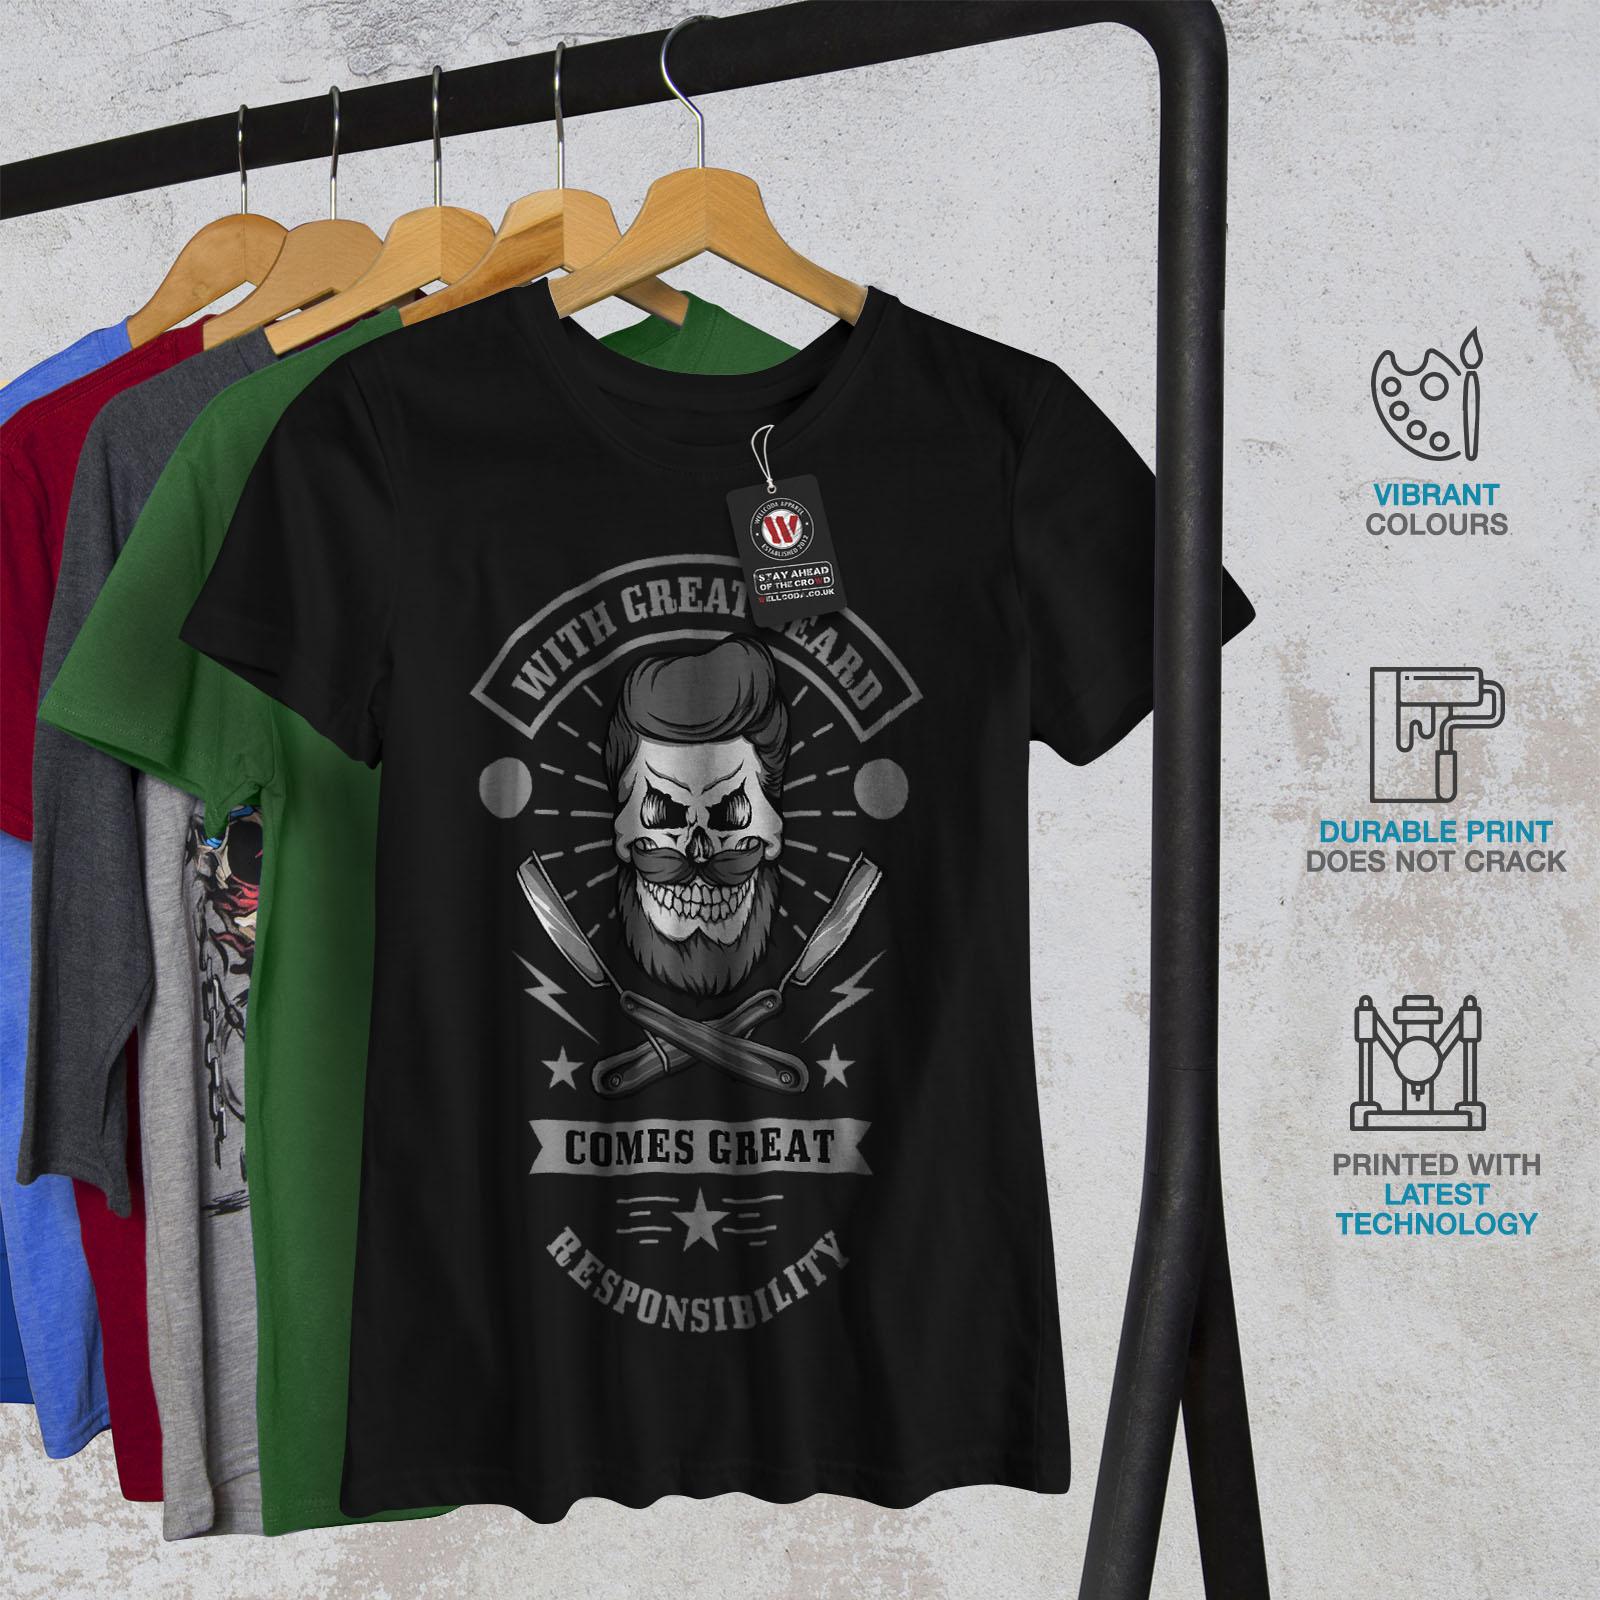 miniature 6 - Wellcoda Great Beard Style Funny Womens T-shirt,  Casual Design Printed Tee